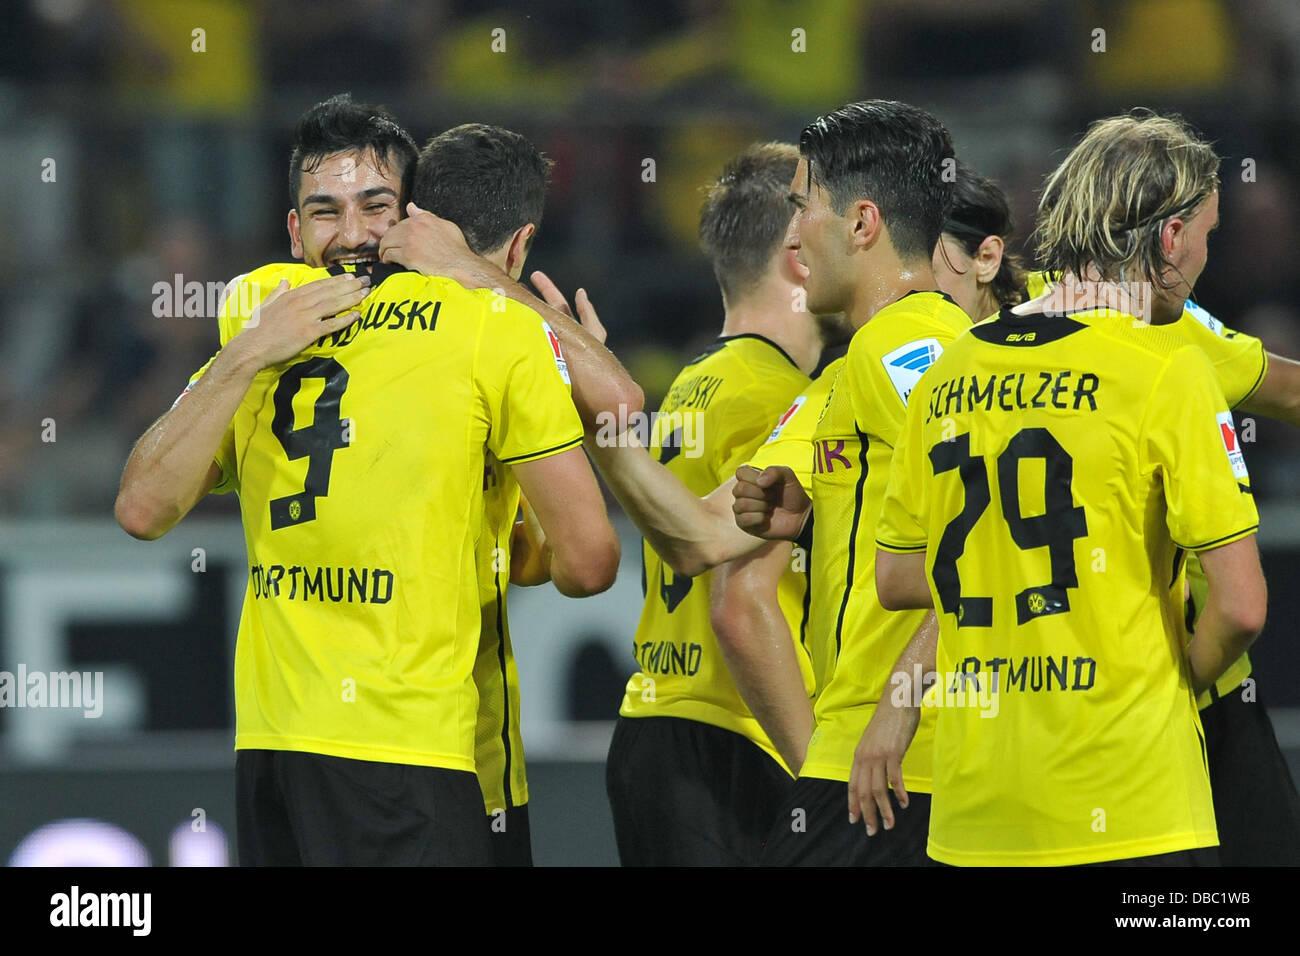 Fußball Supercup: Borussia Dortmund - Bayern München am 27.07.2013 im Signal Iduna Park in Dortmund Dortmunder - Stock Image